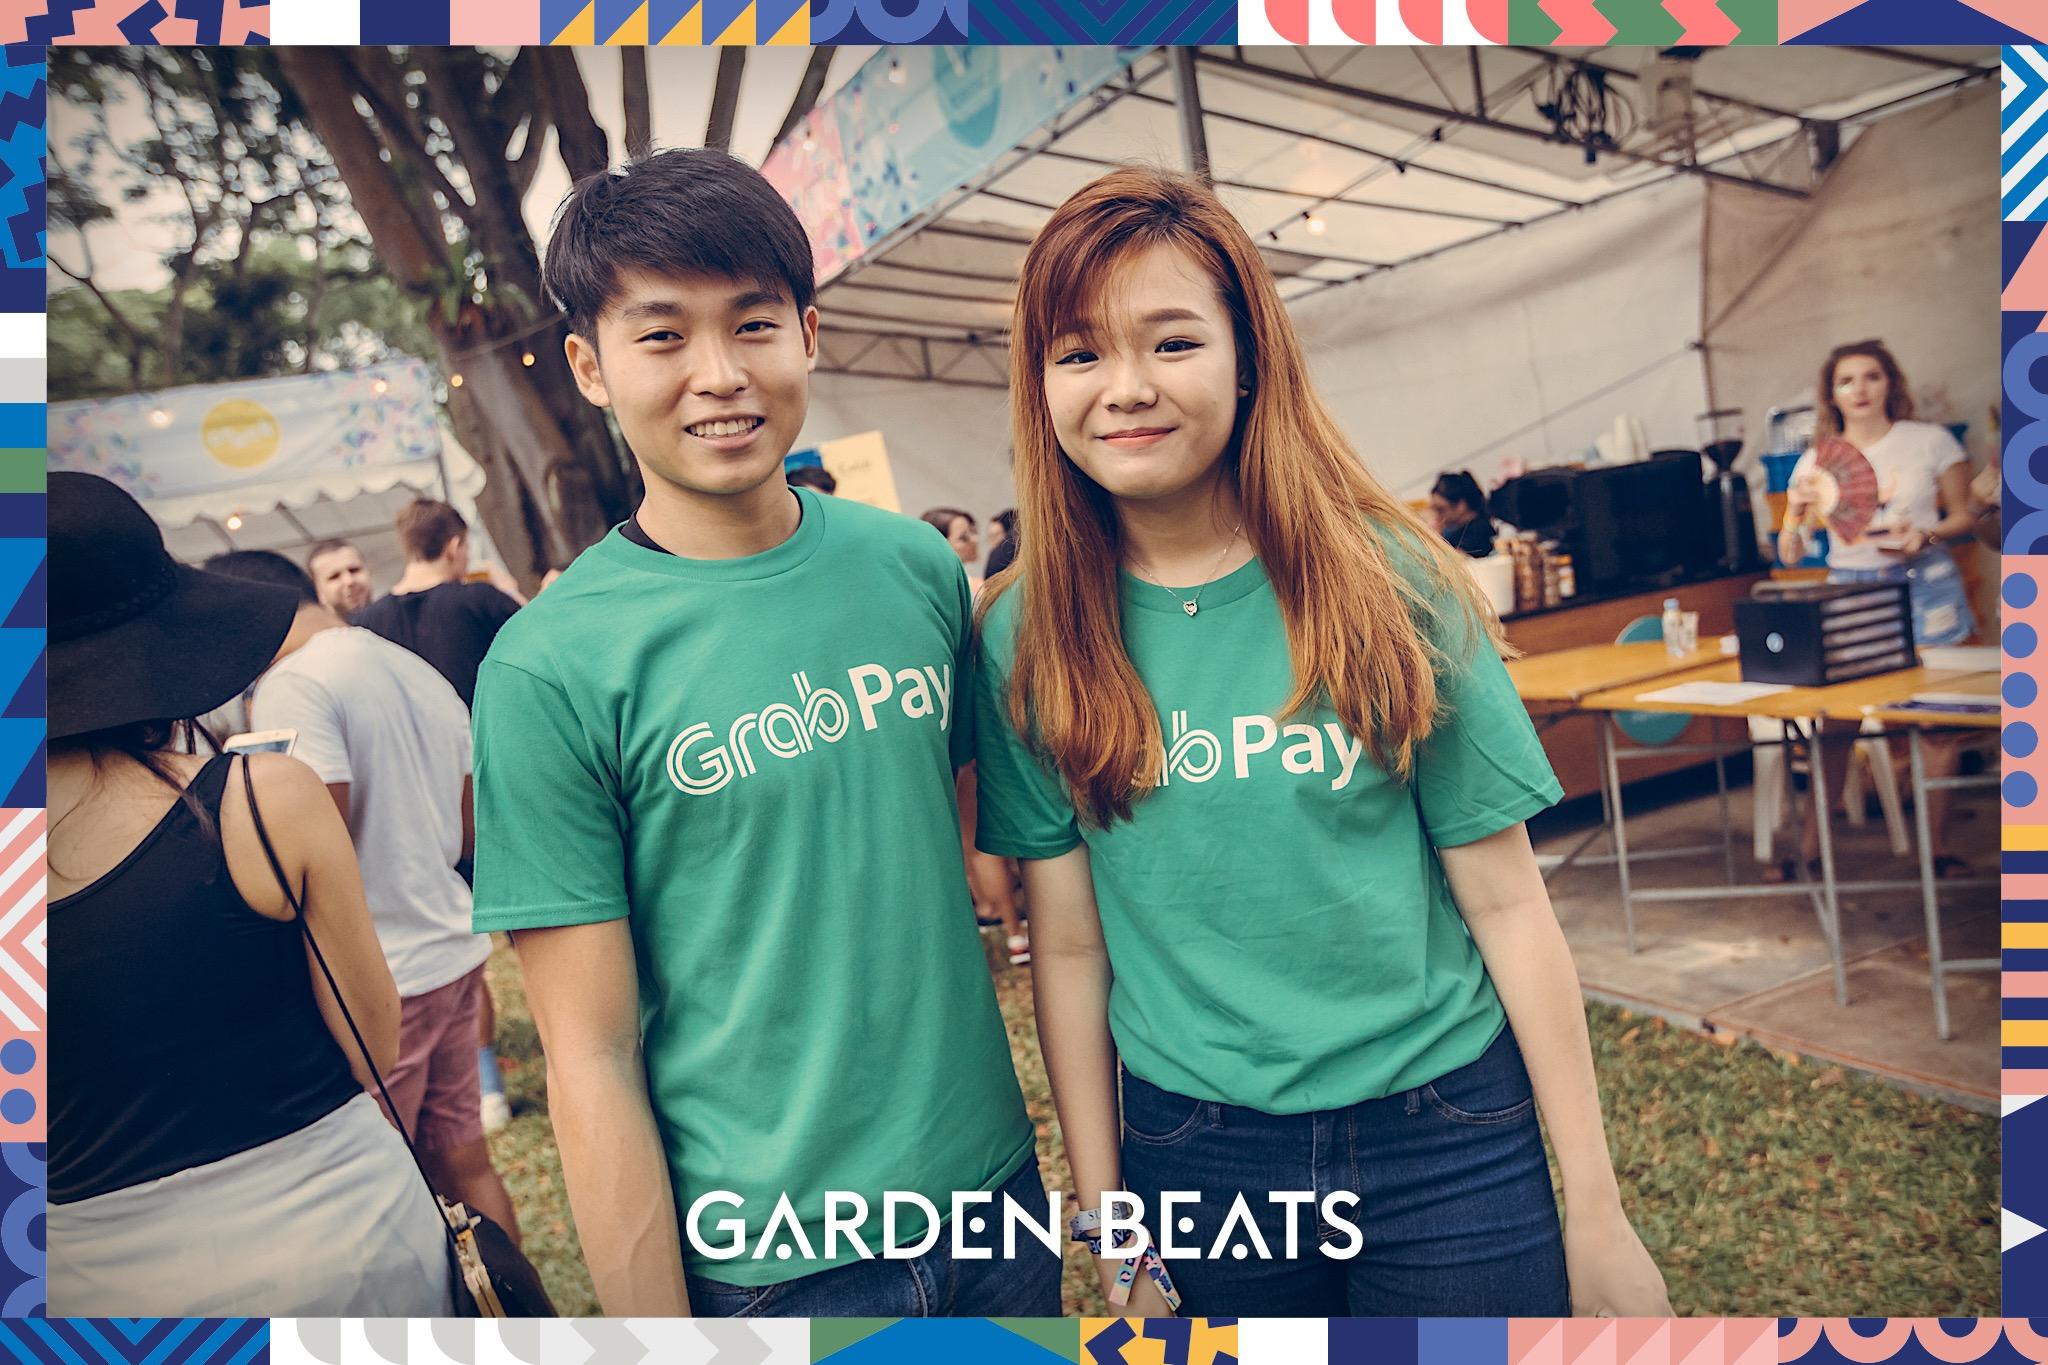 03032018_GardenBeats_Colossal462_Watermarked.jpg